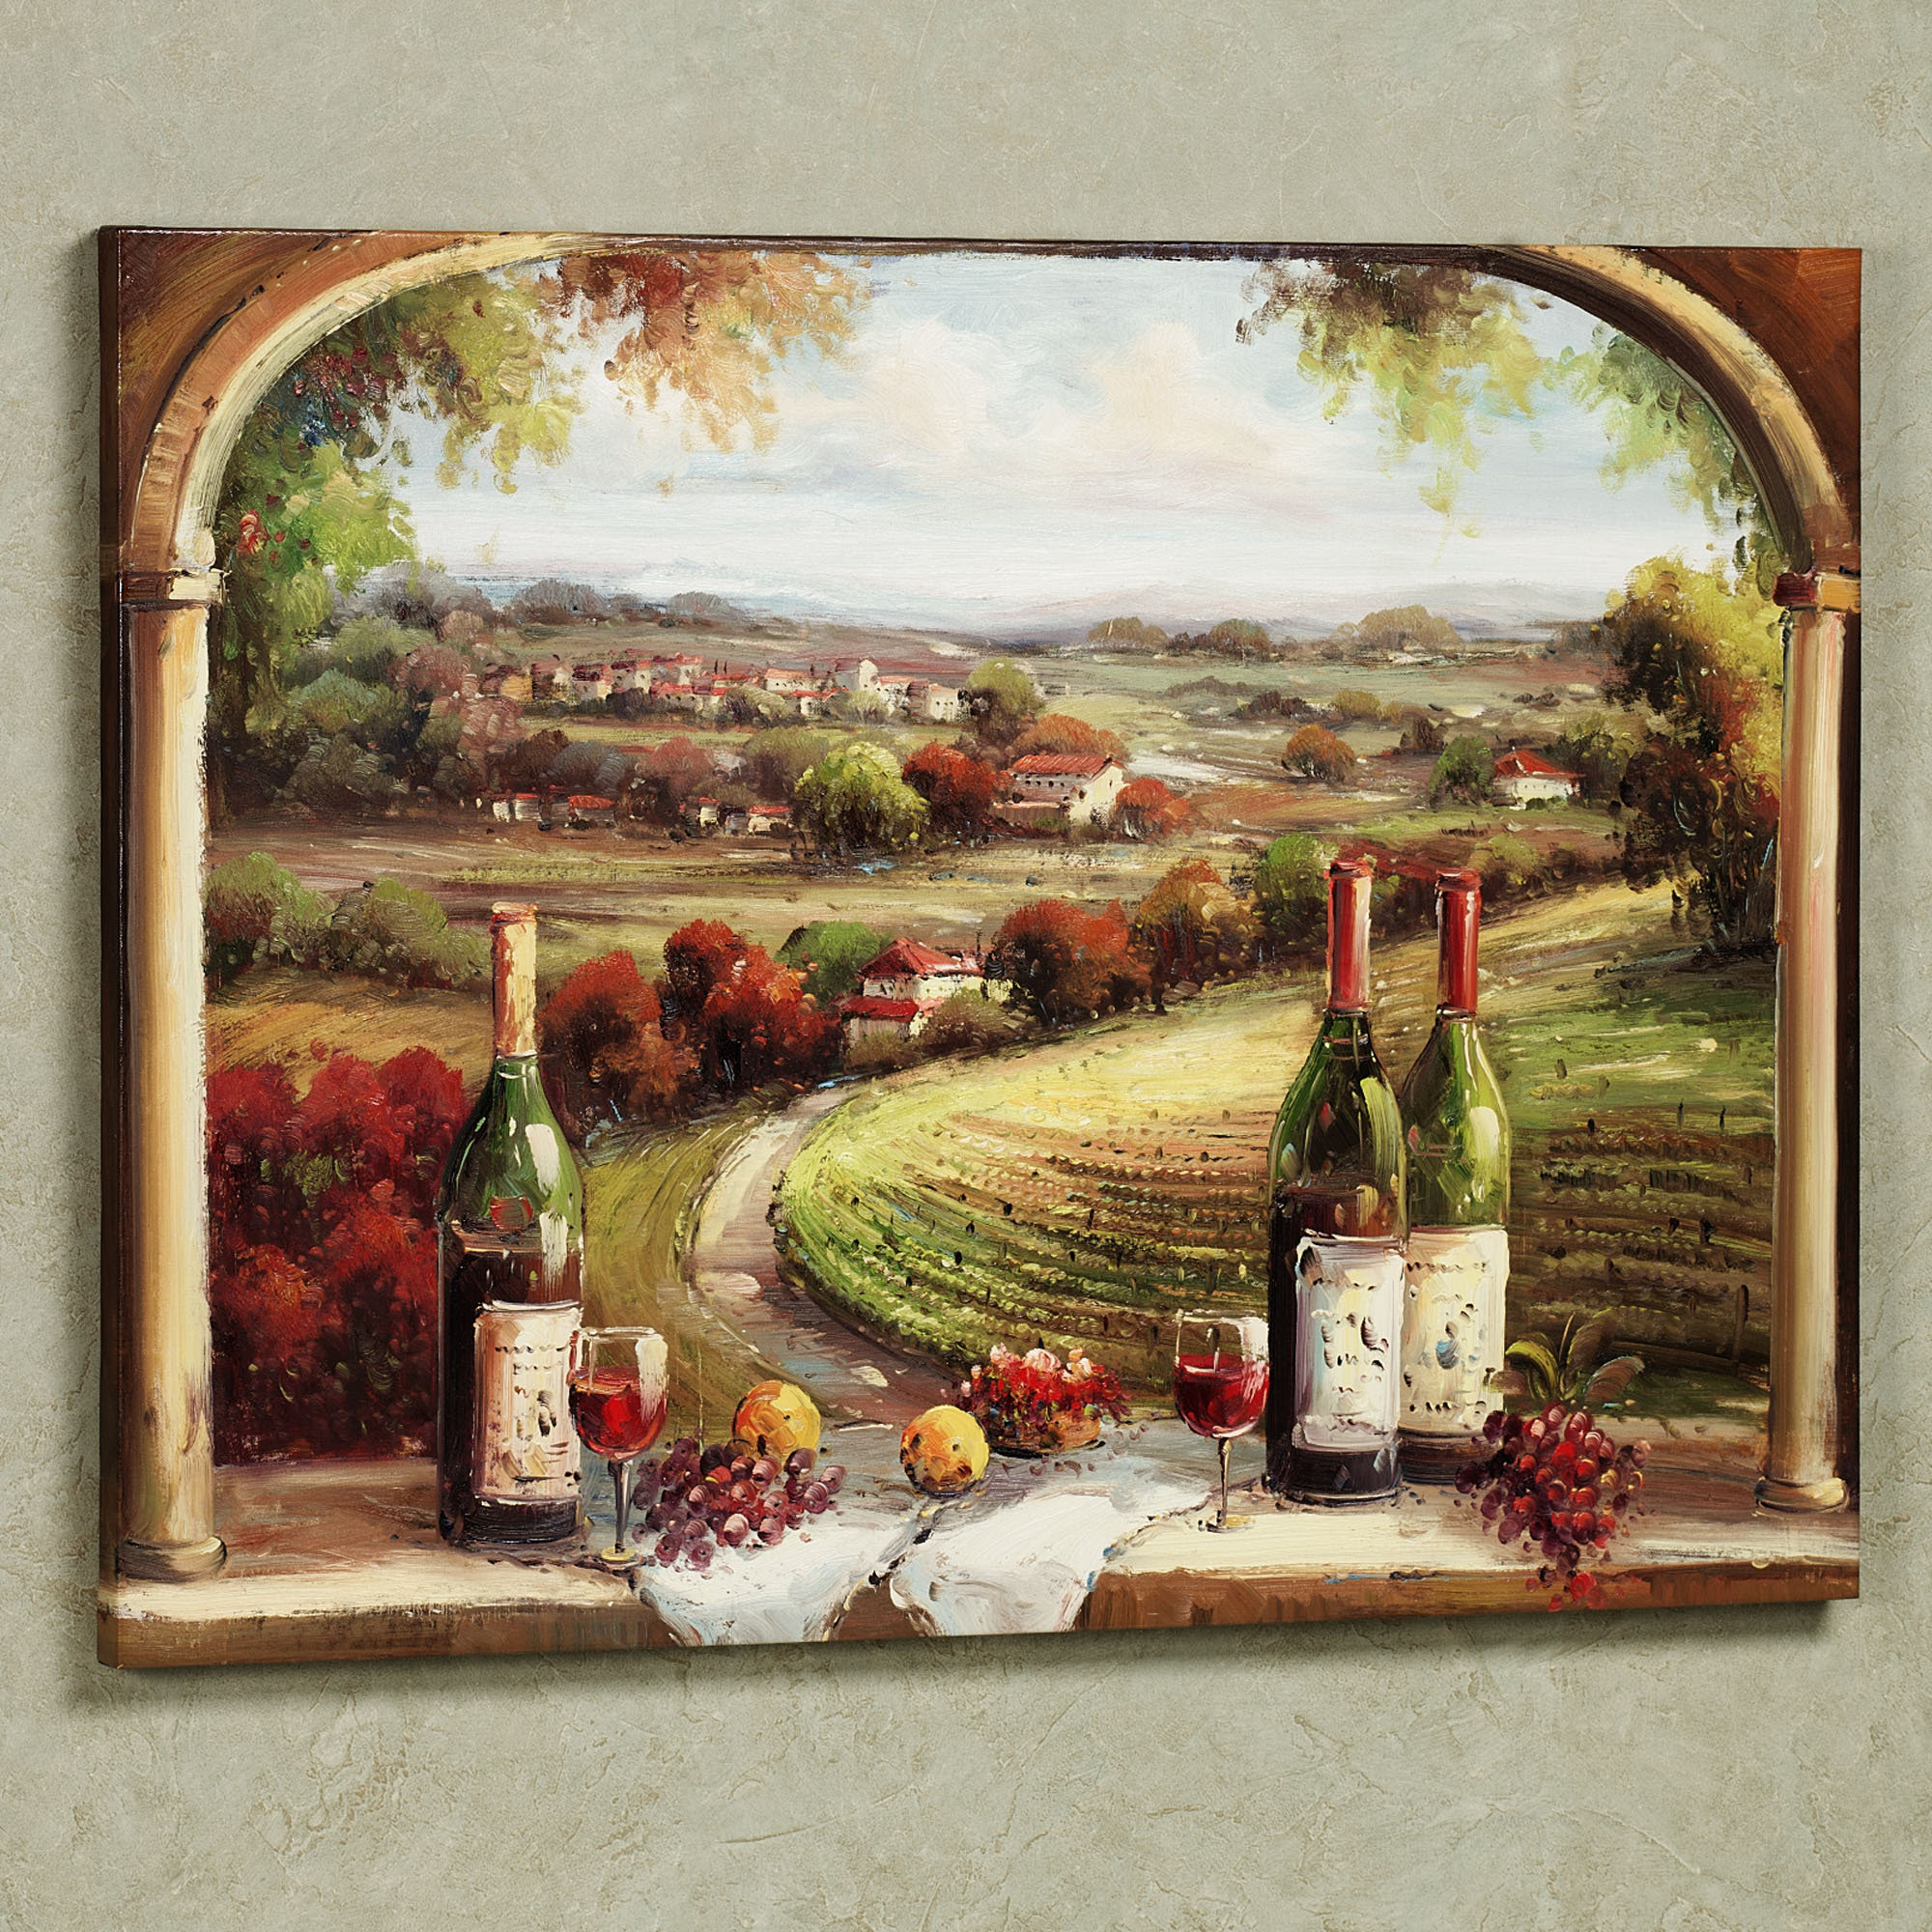 vineyard kitchen decor ezr degreaser tasteful ideas for wine décor a creative mom